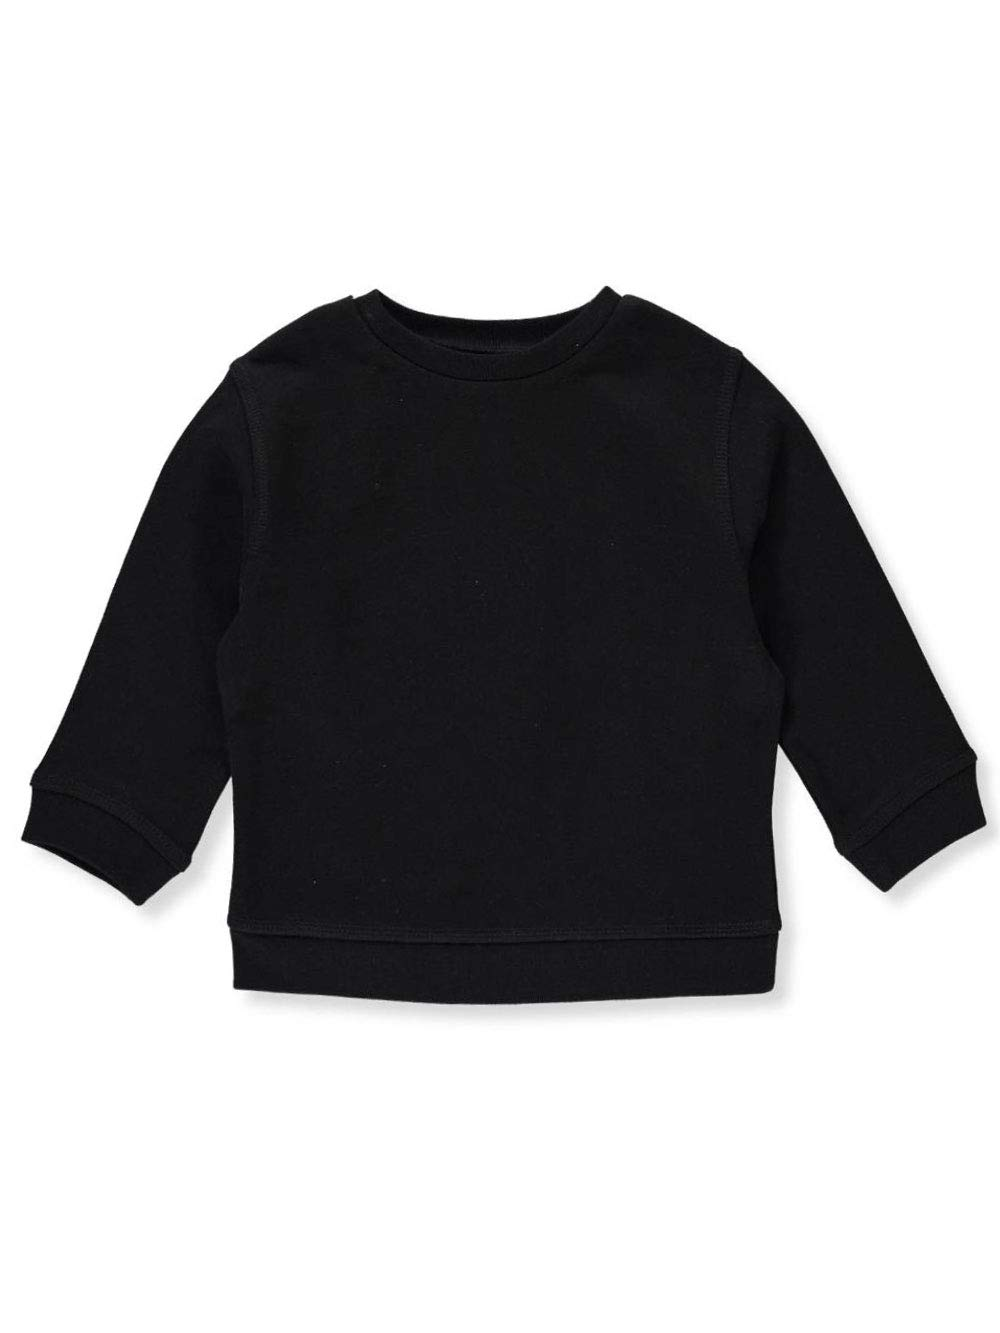 Miniwear Baby Boys' Sweatshirt - black, 3-6 months